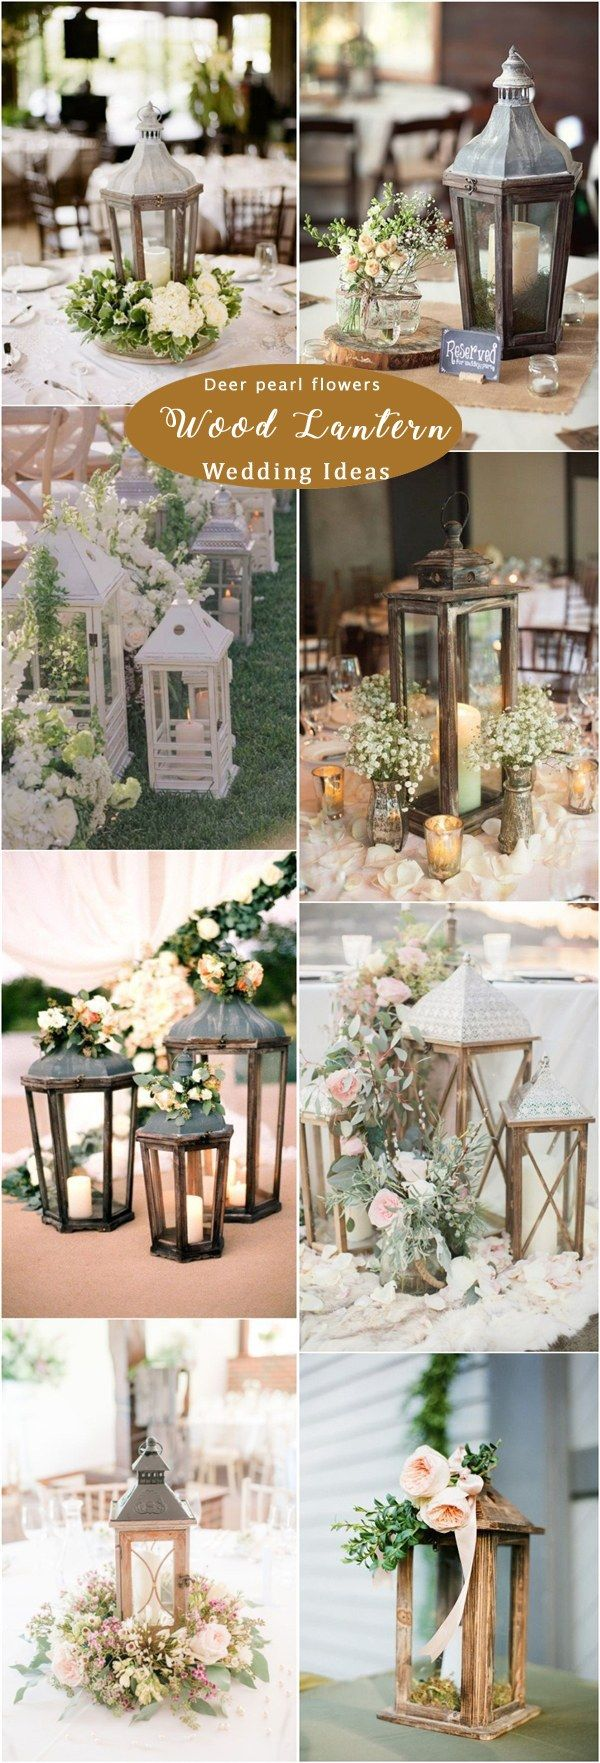 Wedding ideas with lanterns   Rustic Woodsy Wedding Decor Ideas for   Woodsy wedding